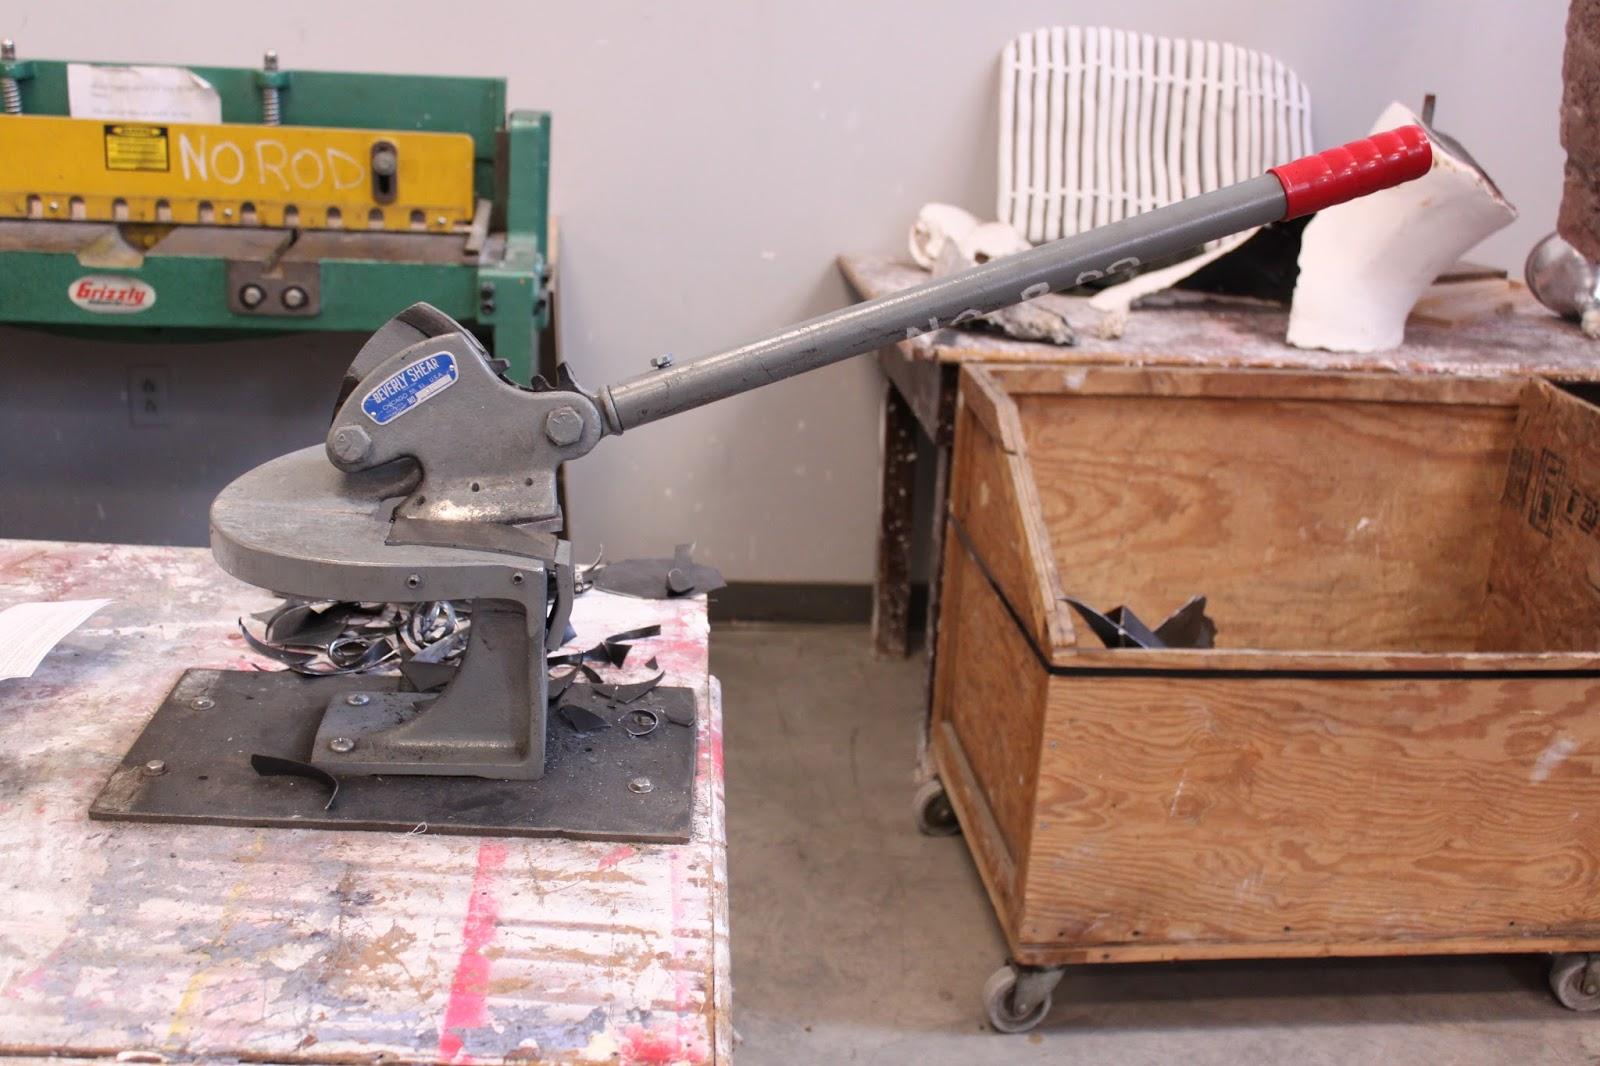 beginner welding projects